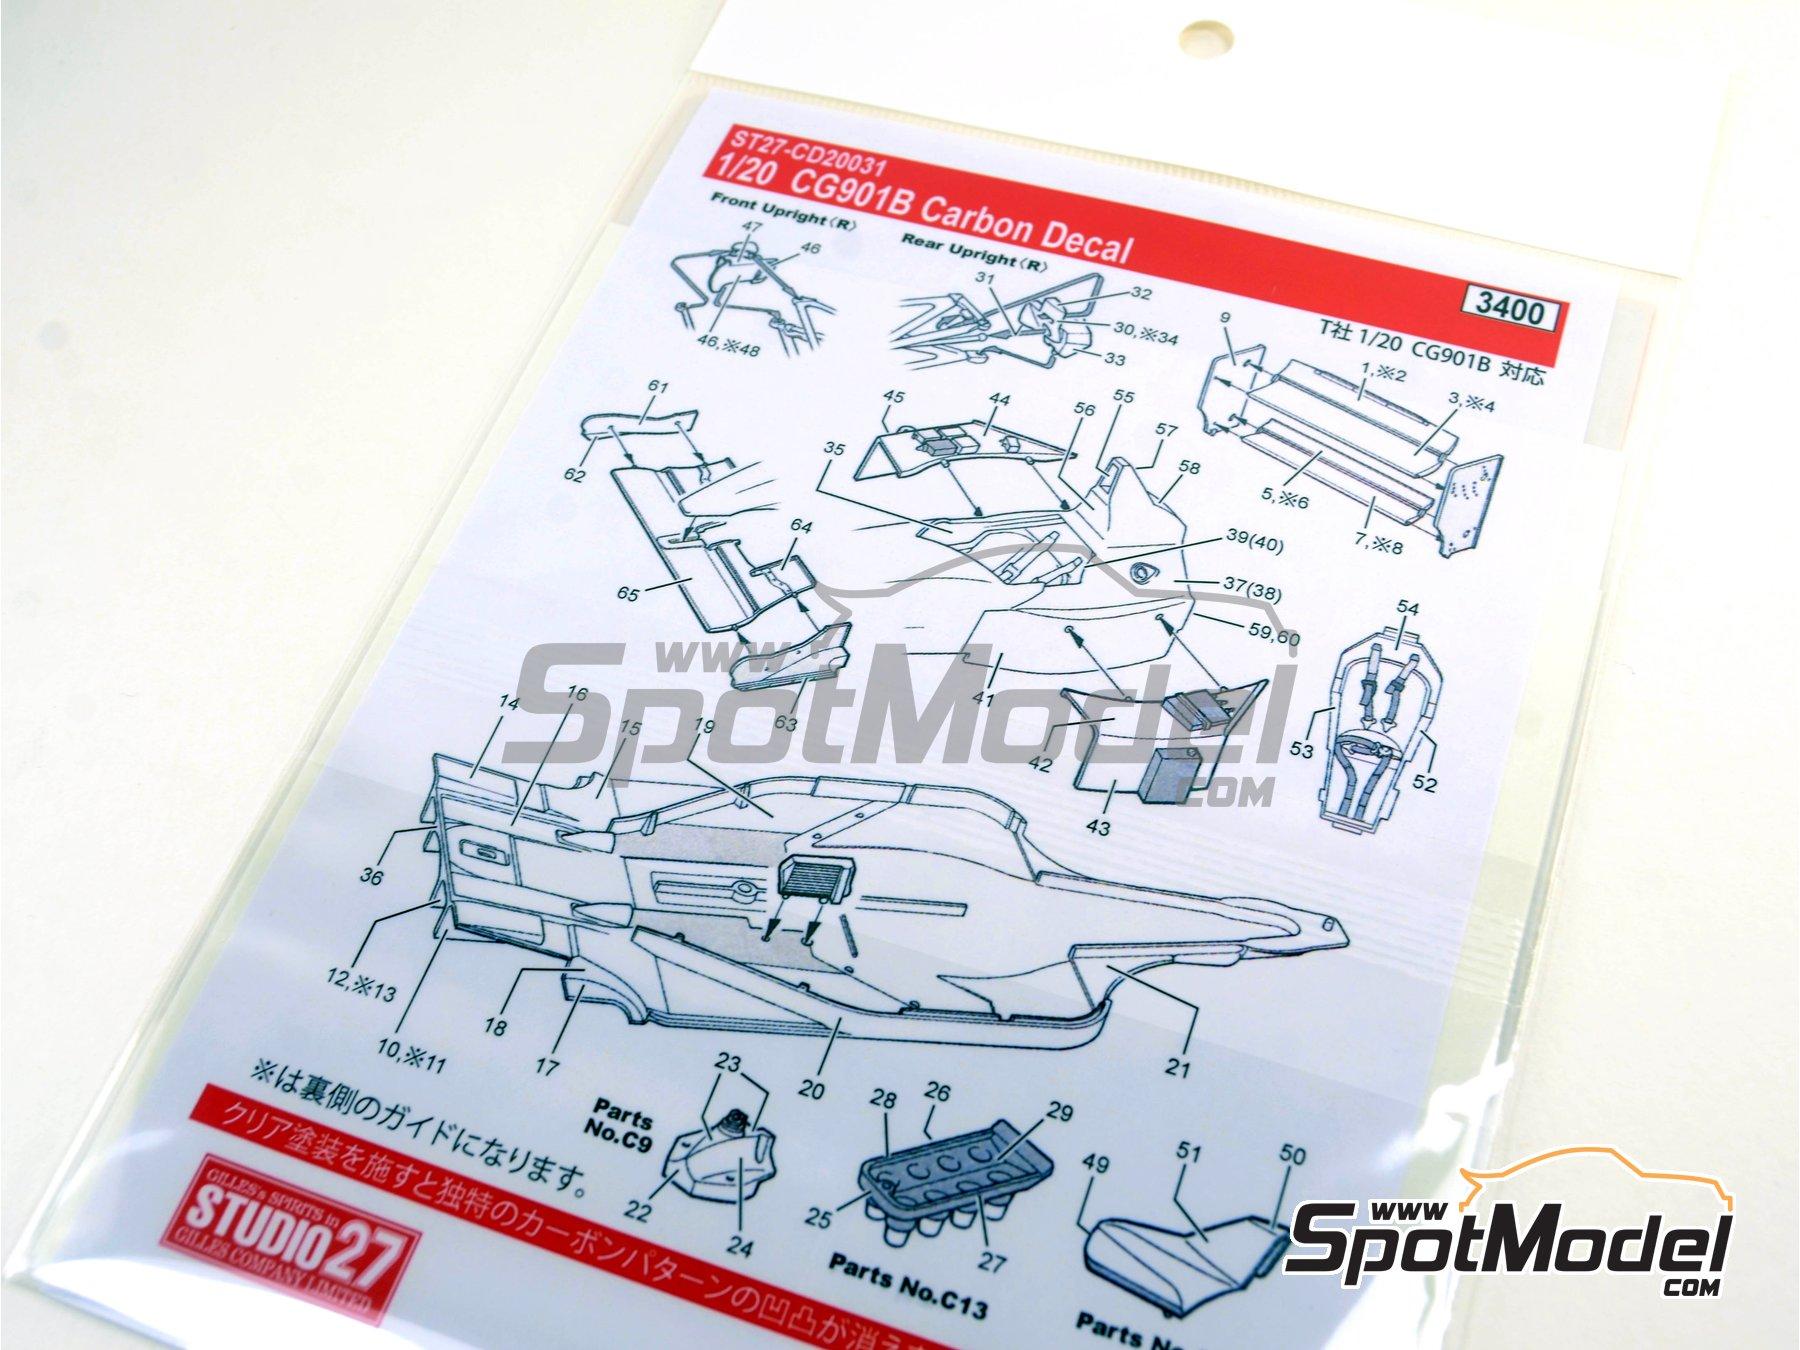 Image 9: Leyton House Judd CG901B Carglass - Campeonato del Mundo de Formula1 1990 | Patron de fibra de carbono en calca en escala1/20 fabricado por Studio27 (ref.ST27-CD20031)